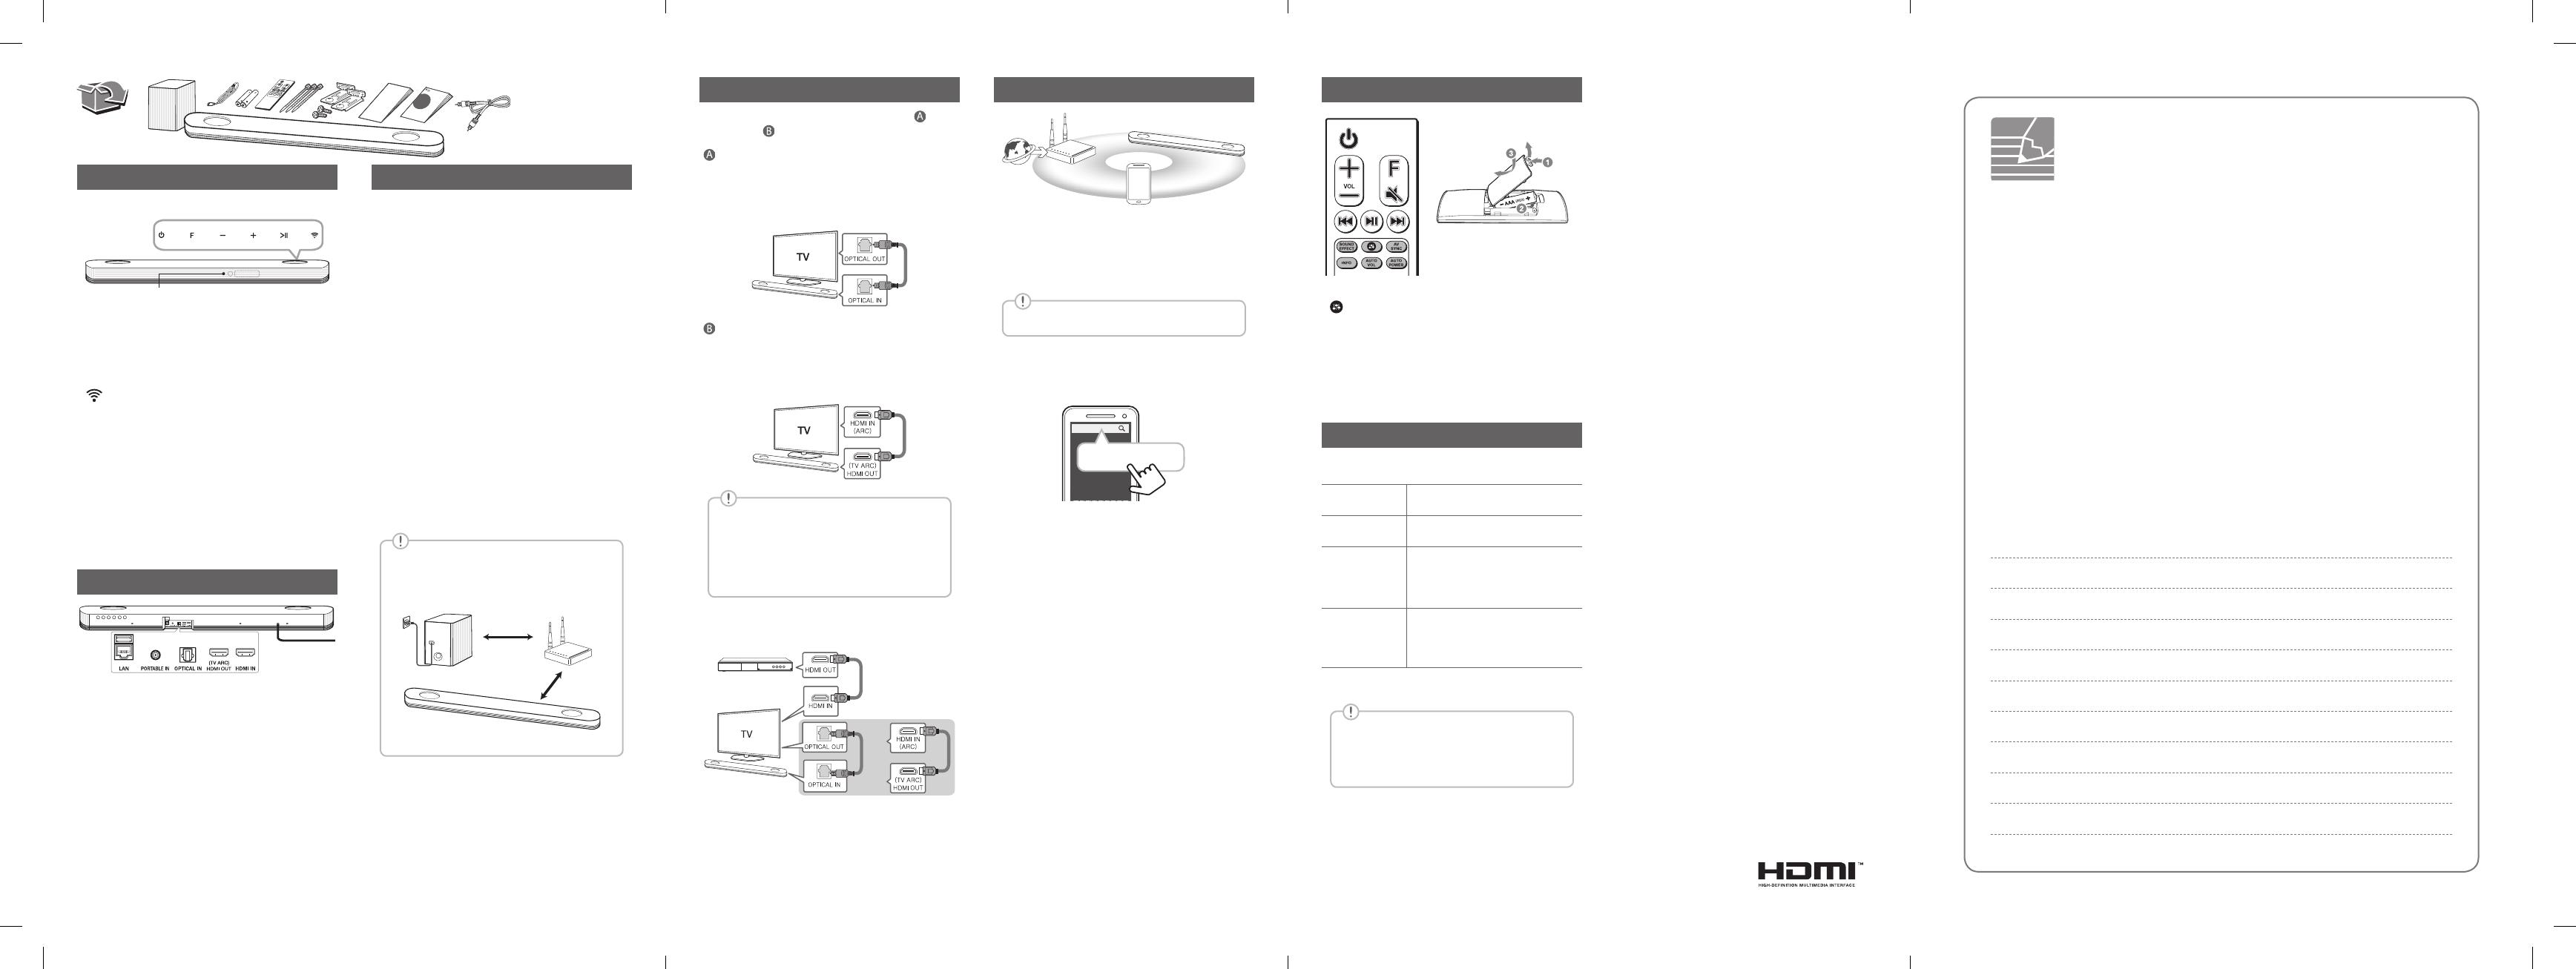 LG SK9Y User Manual Guide SK9Y DUSALLK SIM (Sheet) ENG MFL70420305